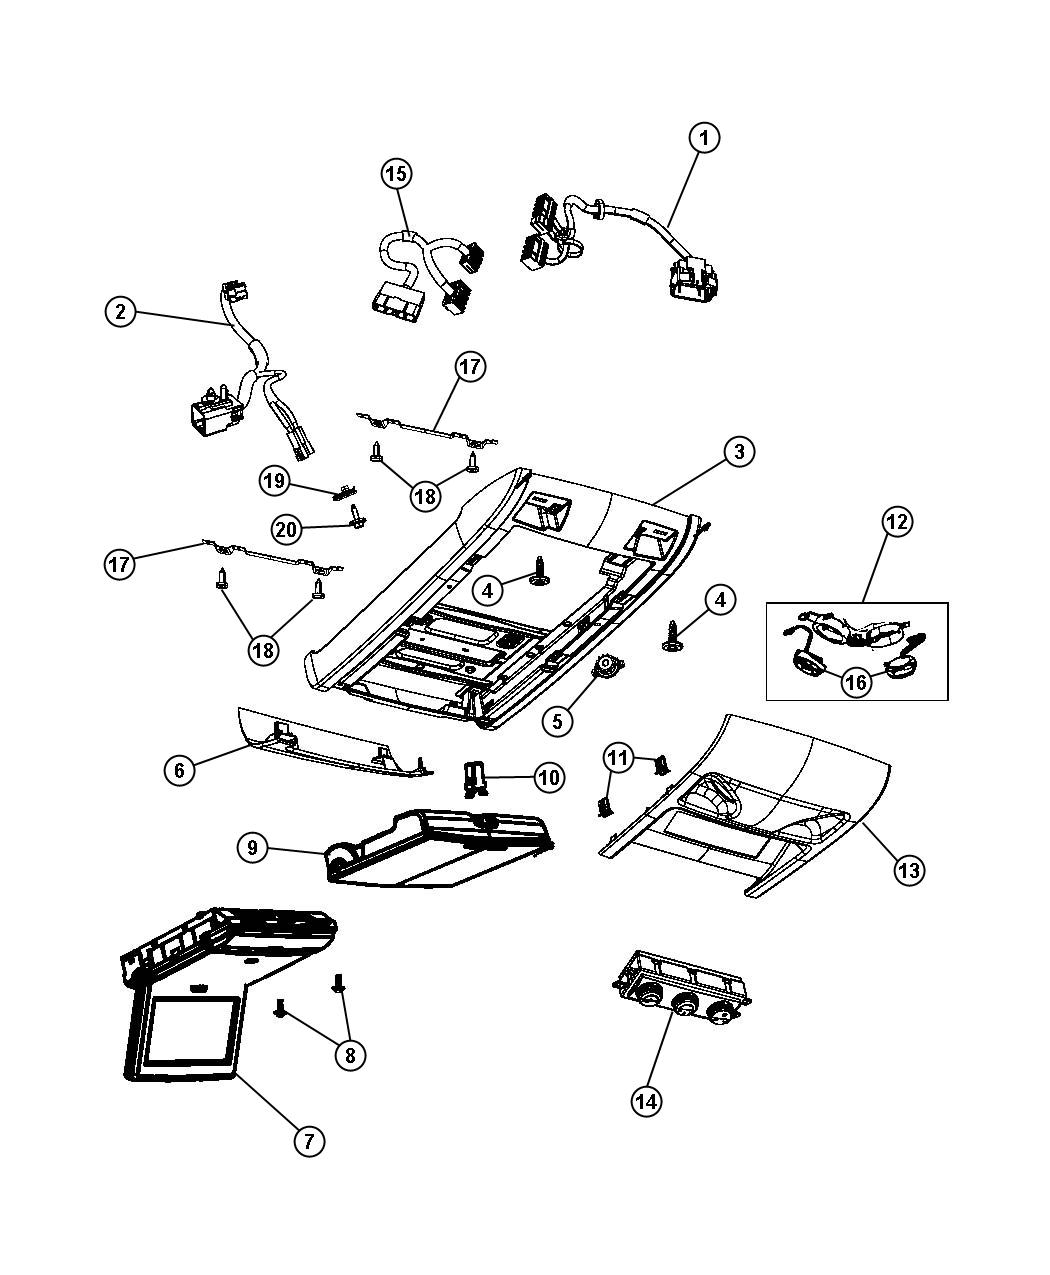 Dodge Grand Caravan Wiring. Jumper, overhead console. Dvd